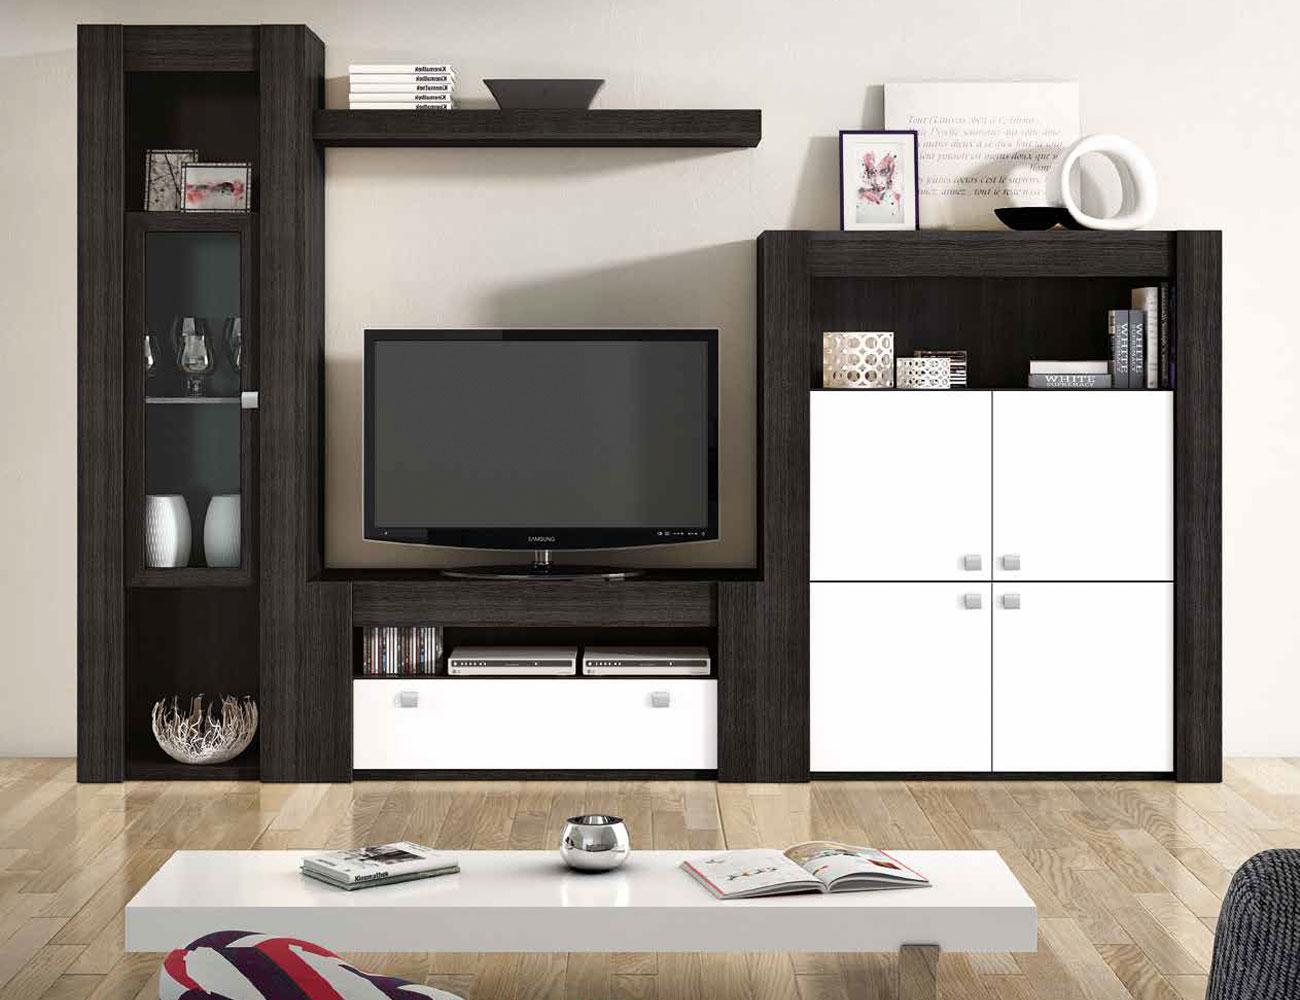 Mueble salon moderno comp05b1